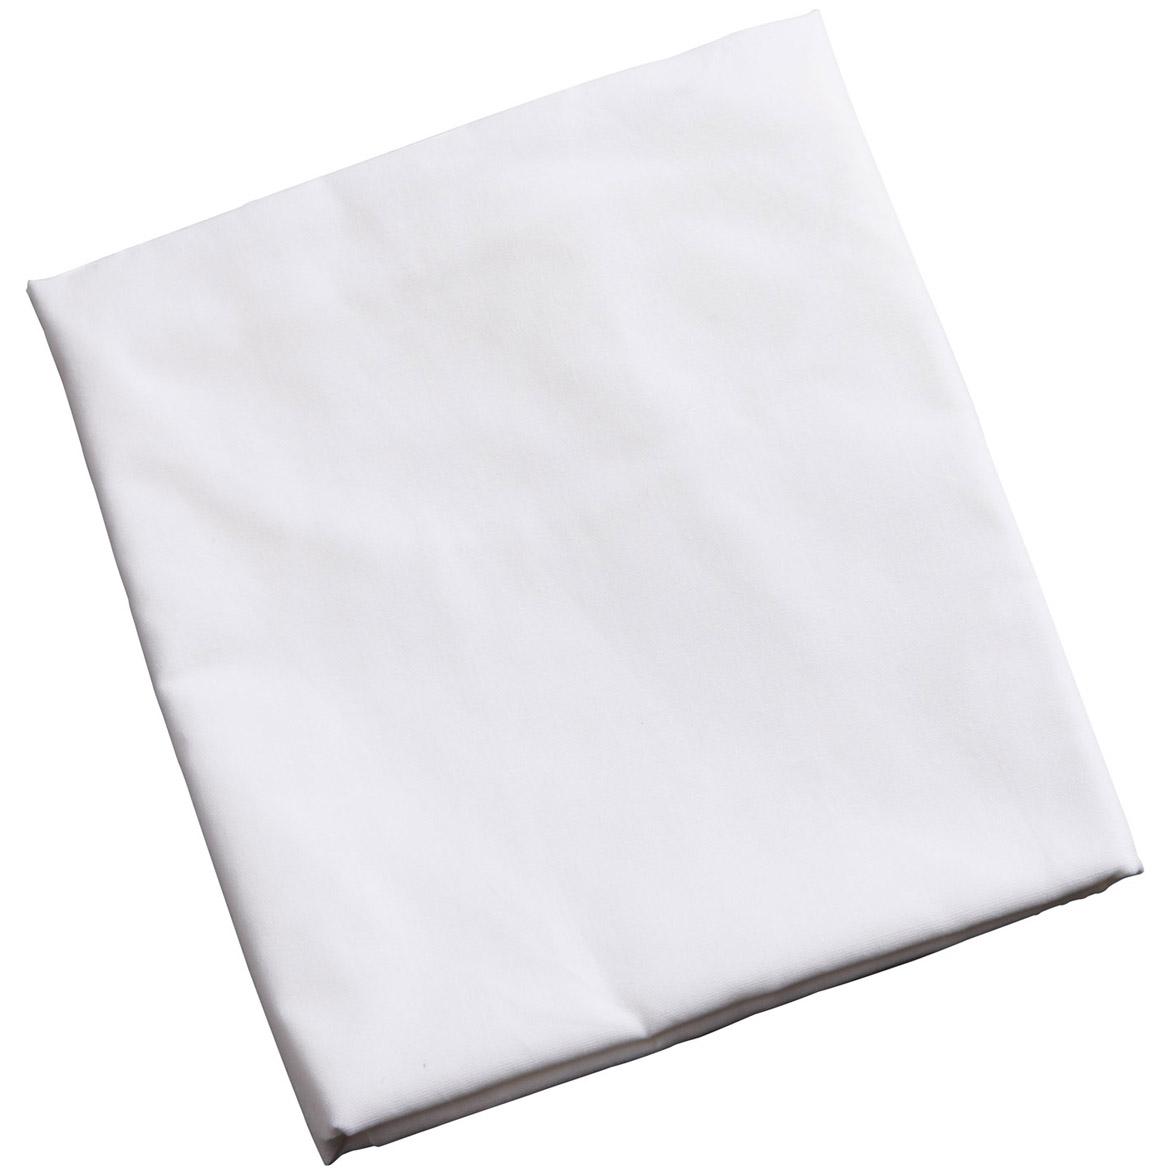 Sleep Apnea Pillowcase-331275